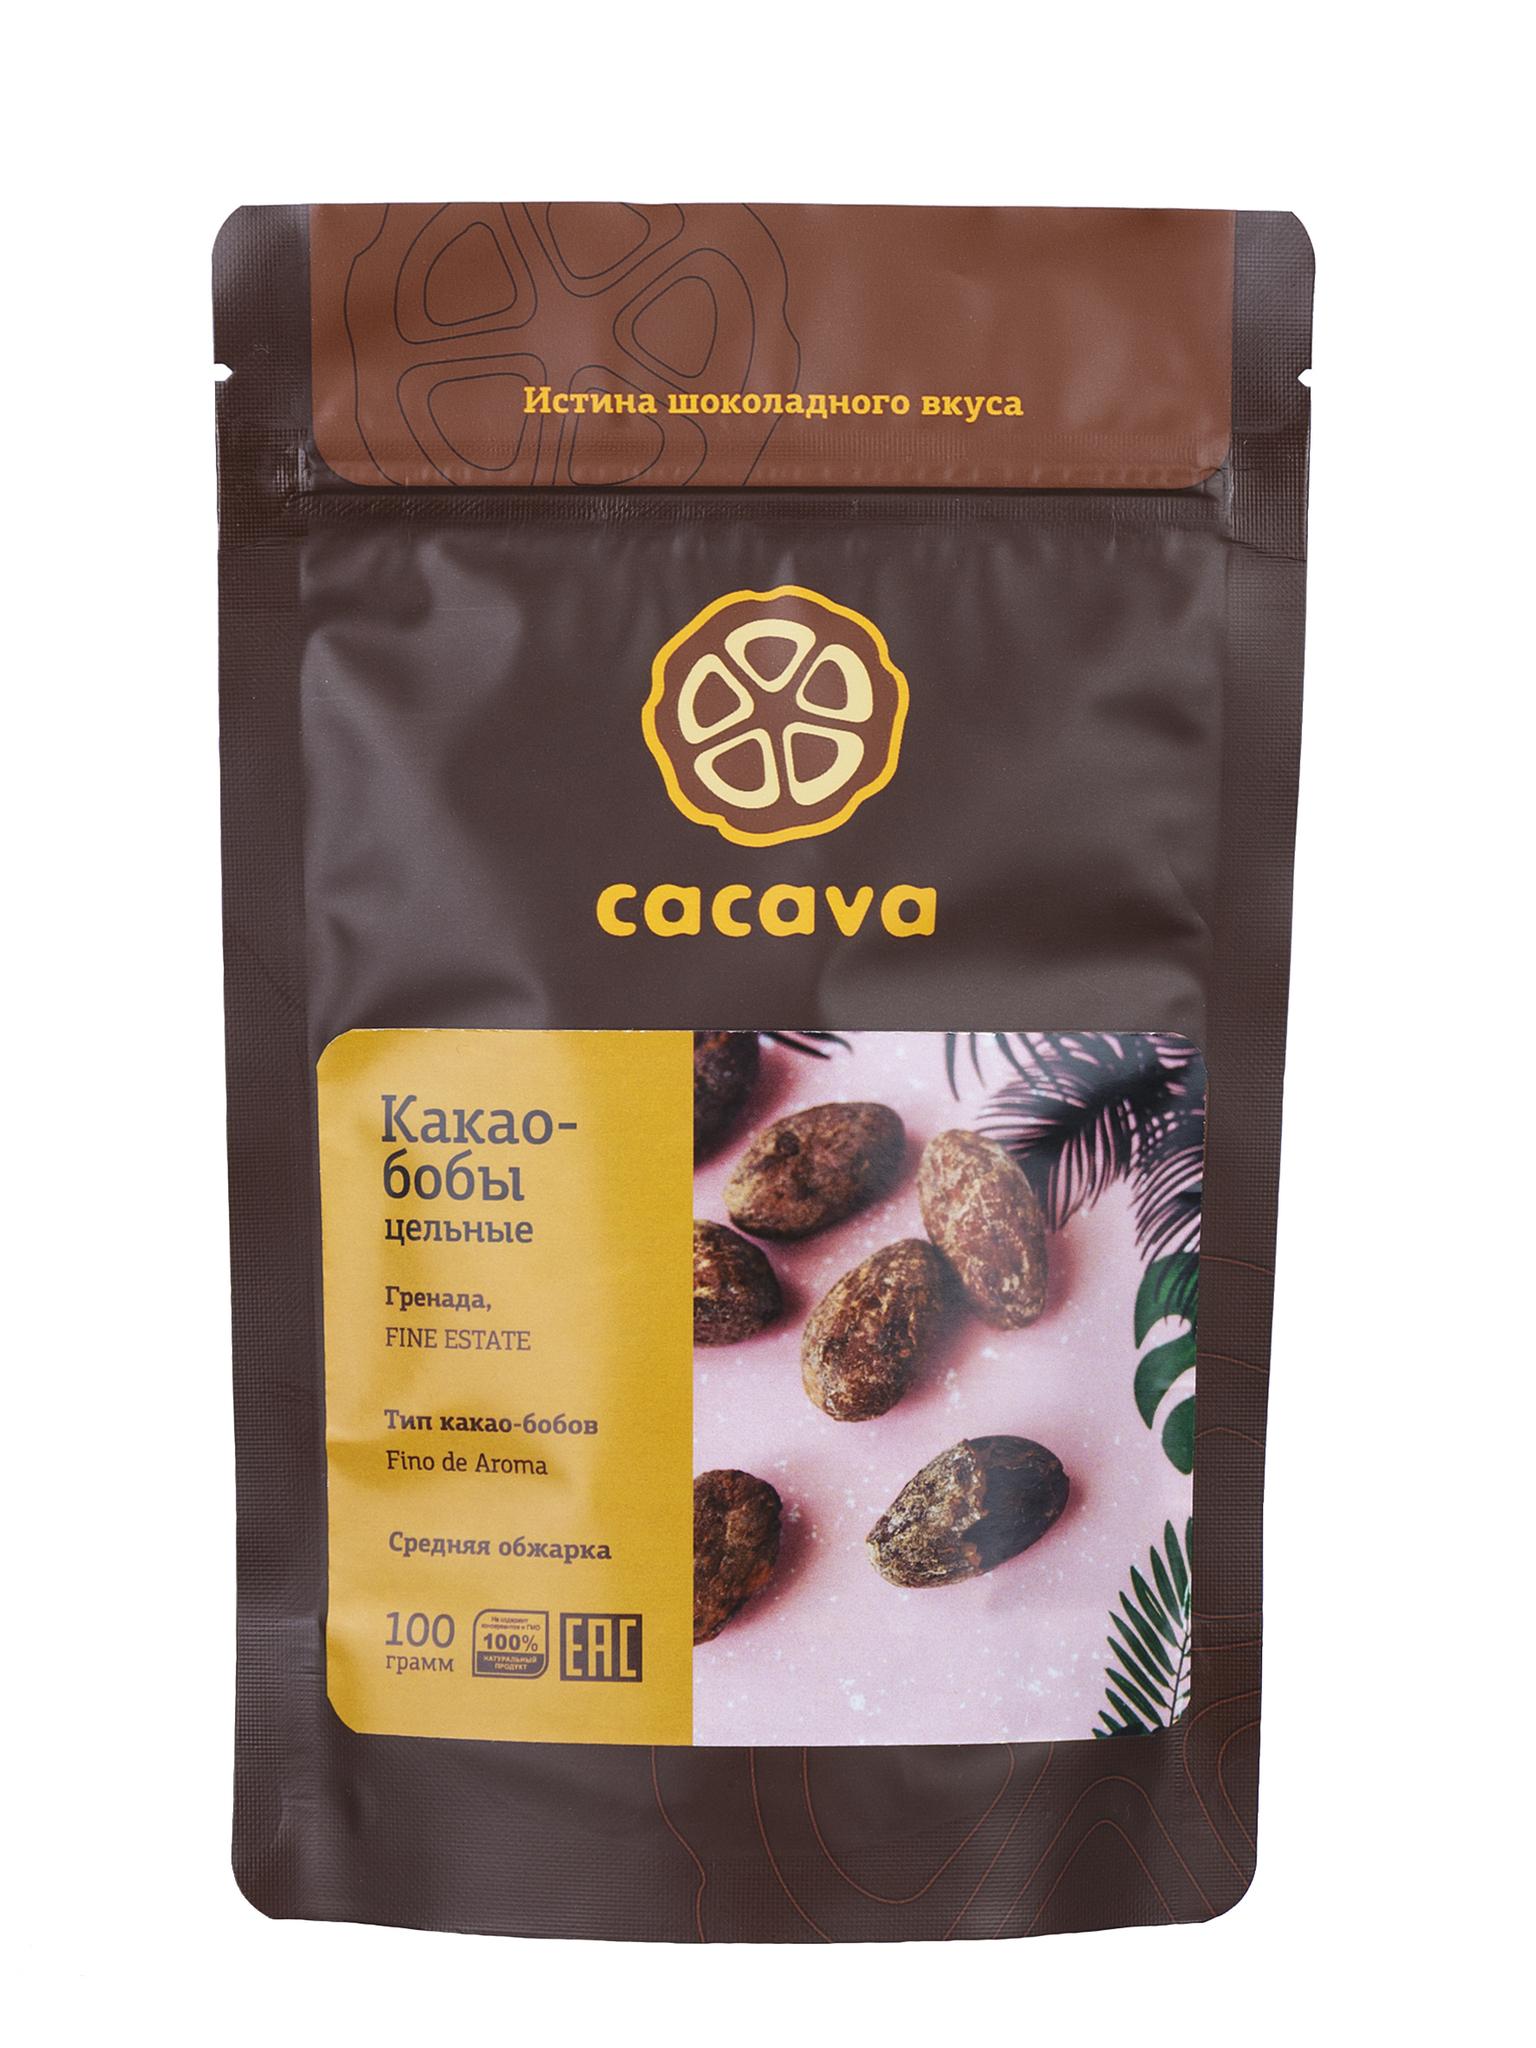 Какао-бобы цельные (Гренада), упаковка 100 грамм